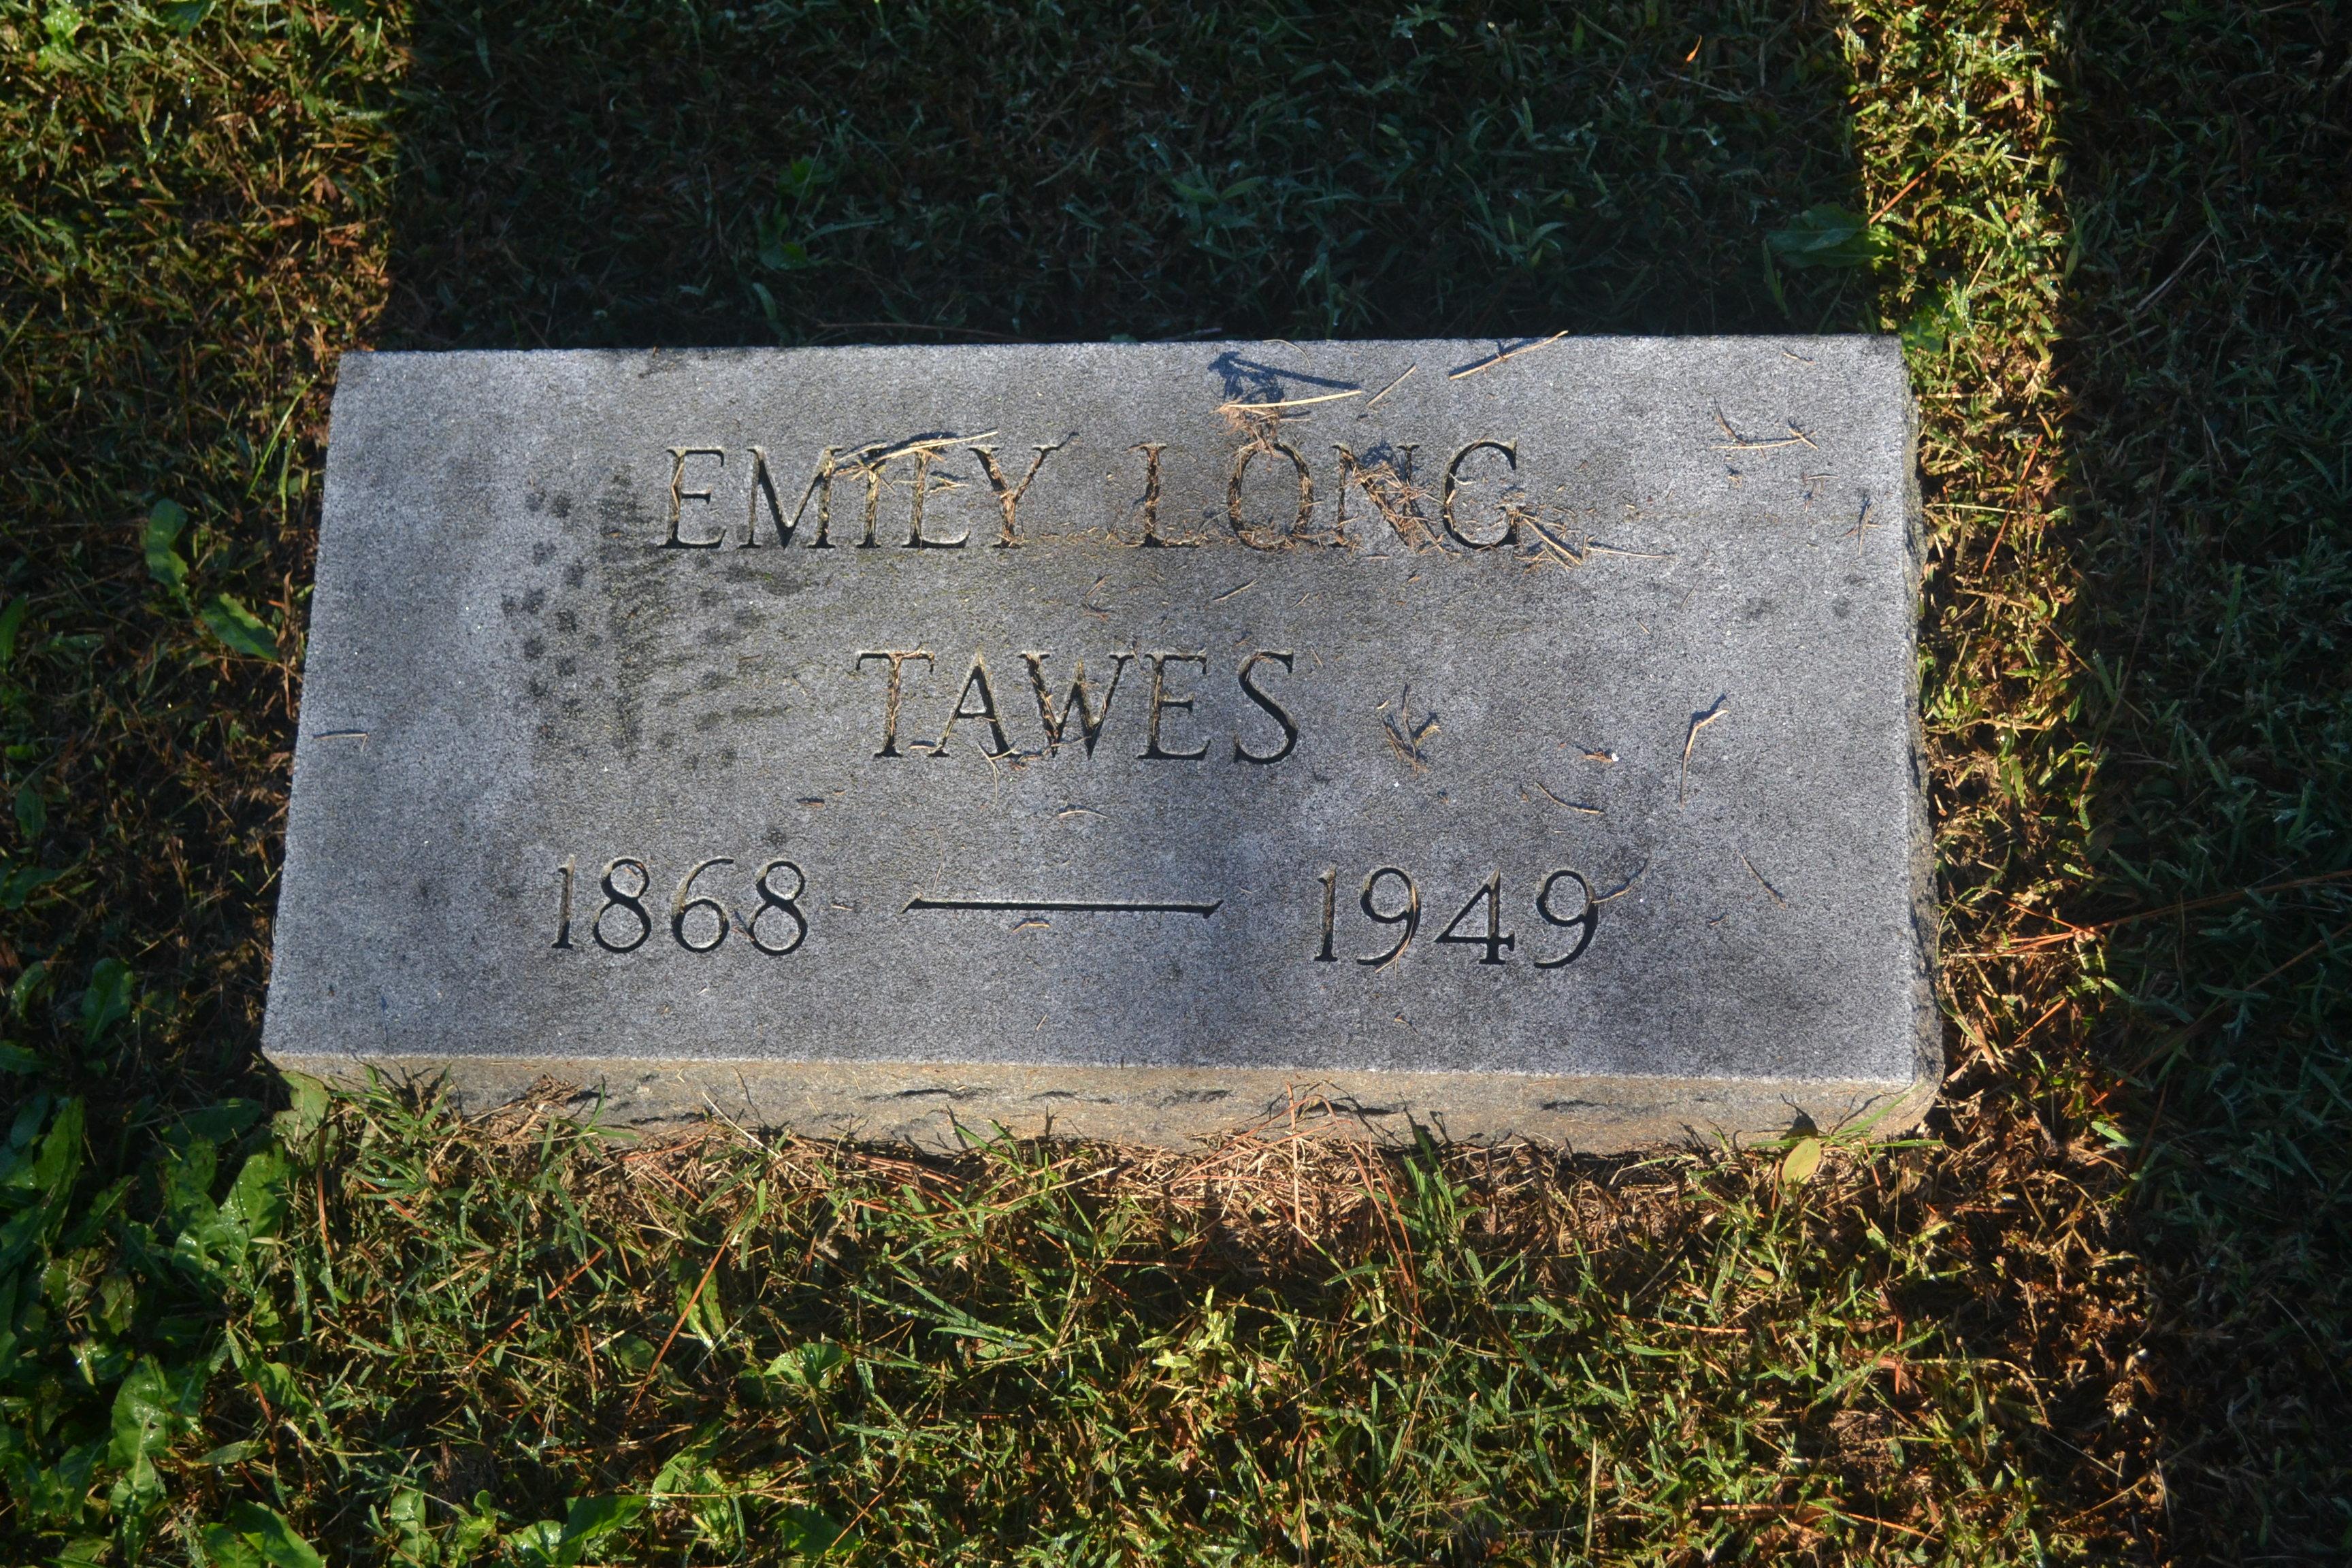 Emily Long Tawes